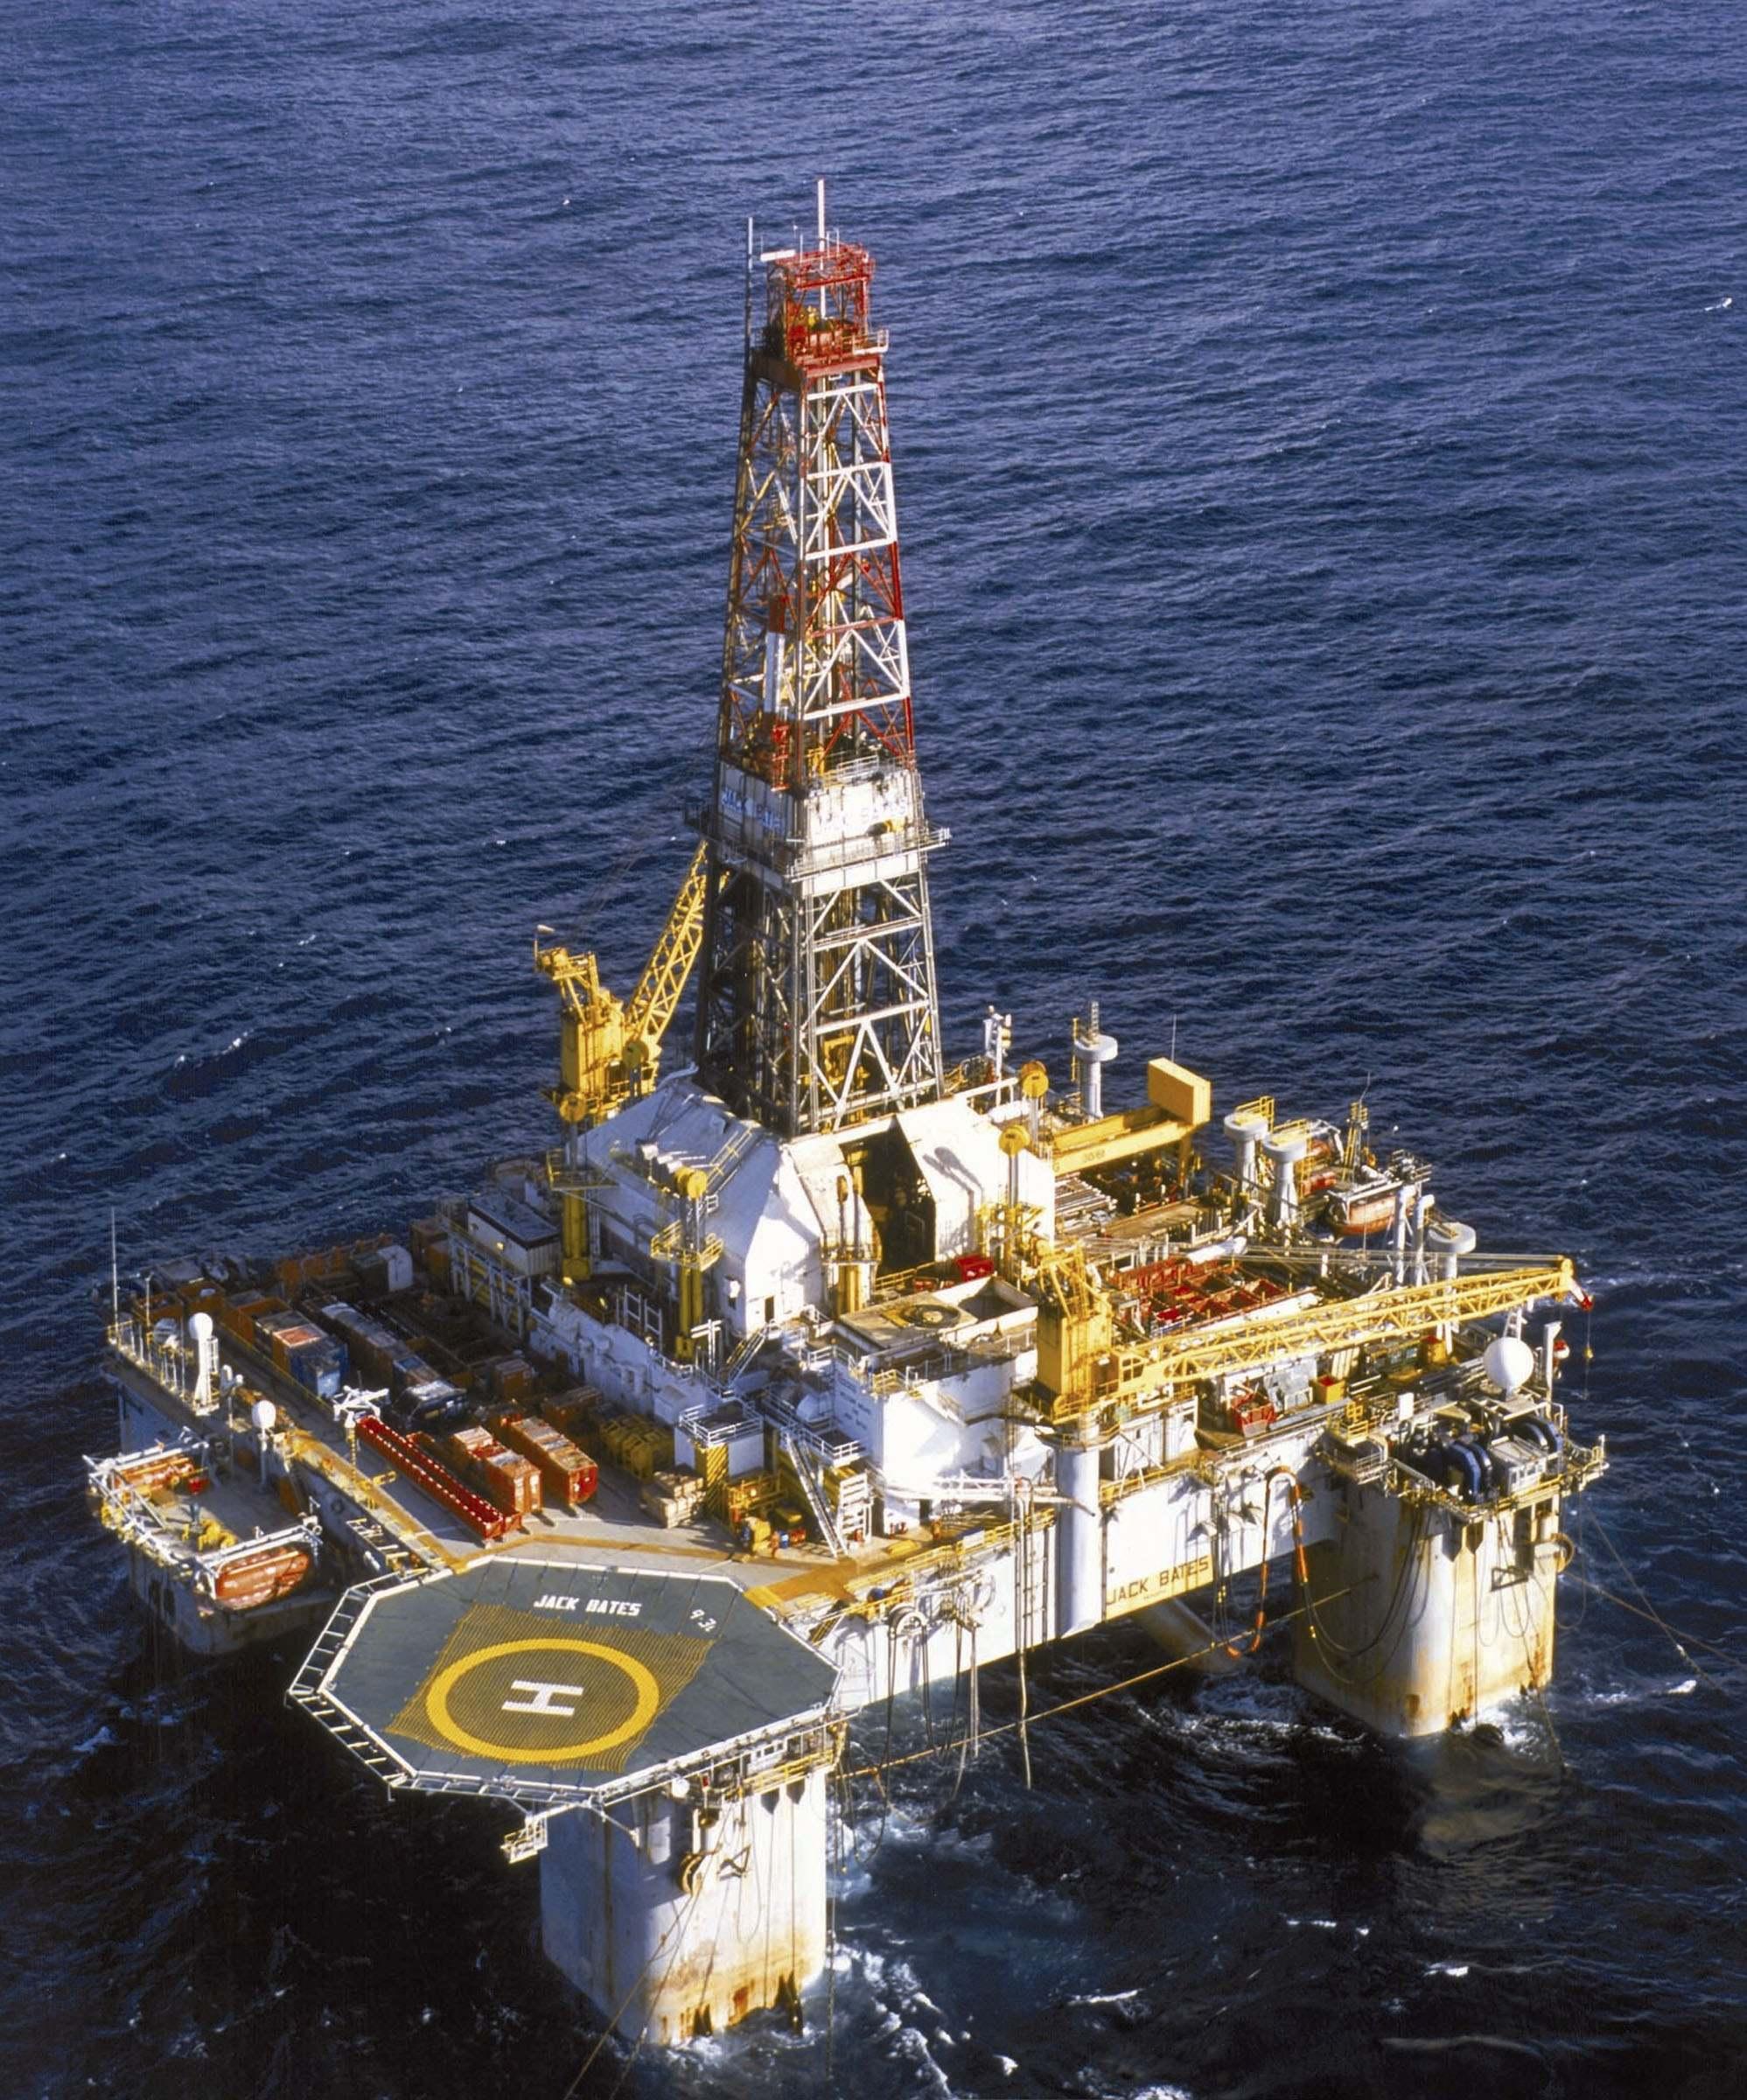 Woodside Petroleum Ltd's Jack Bates drilling platform is seen off the coast of Western Australia in this undated handout photograph.